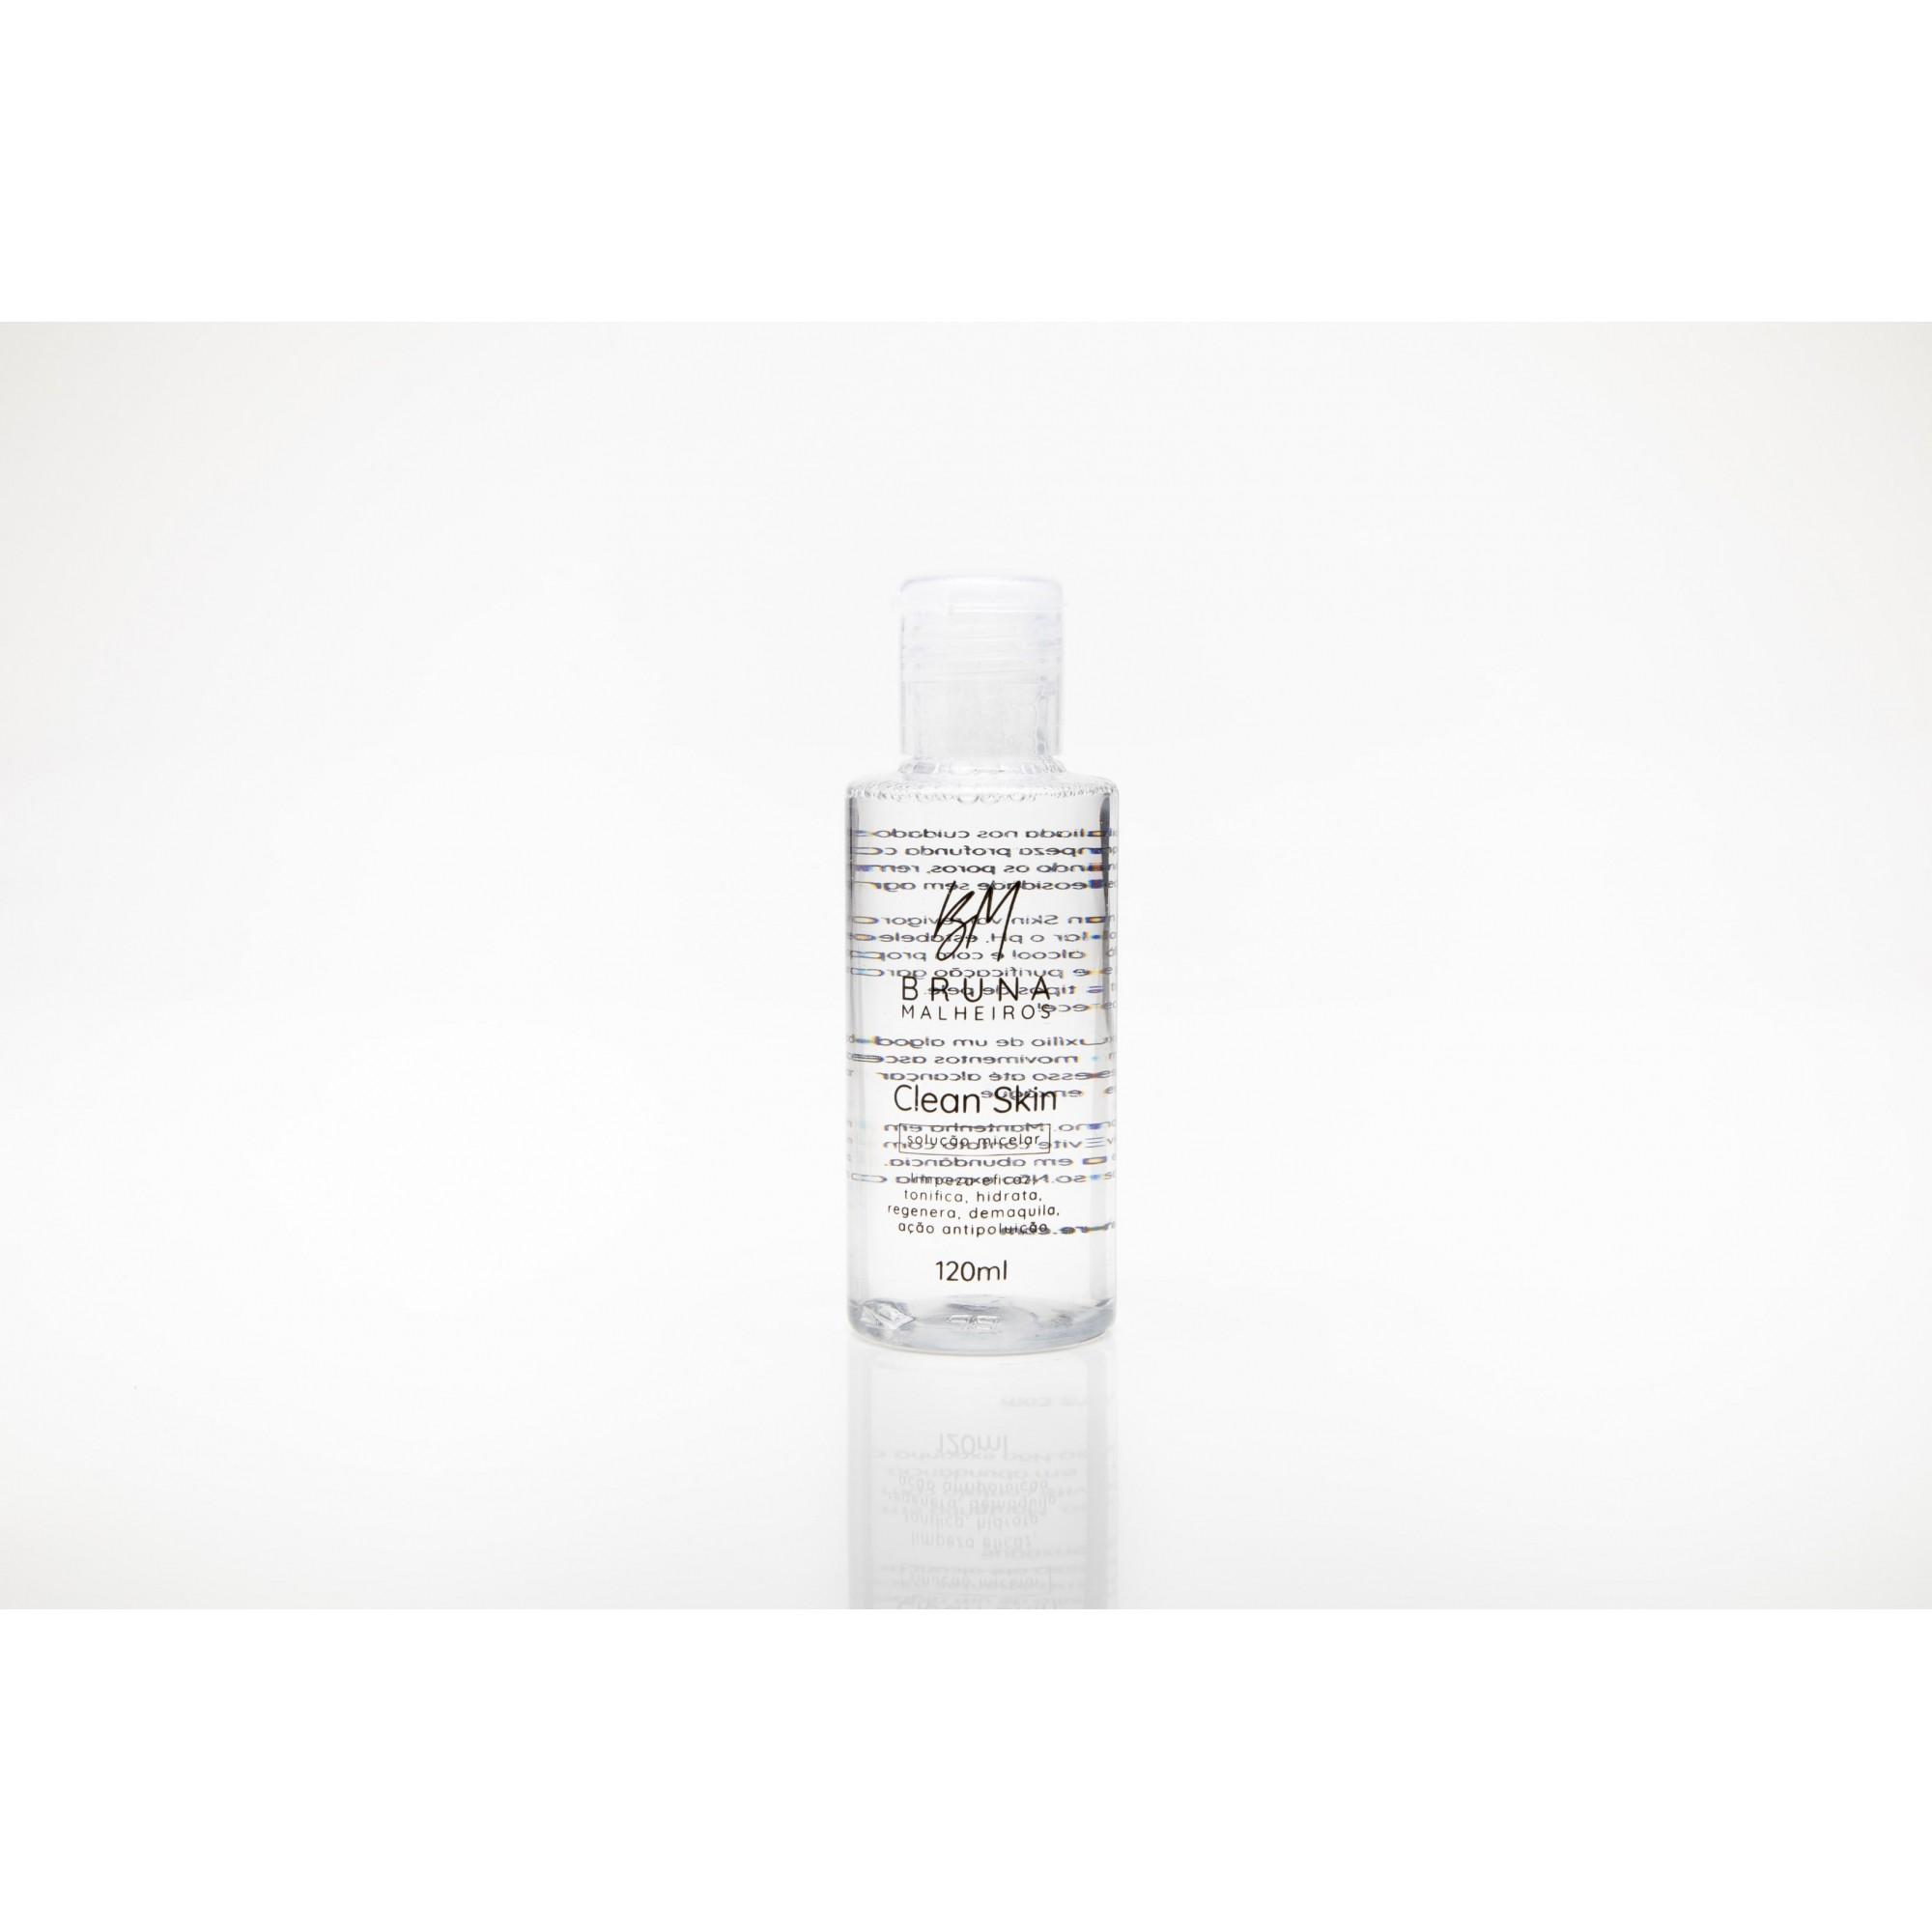 Clean skin - soluçao micelar - bruna malheiros